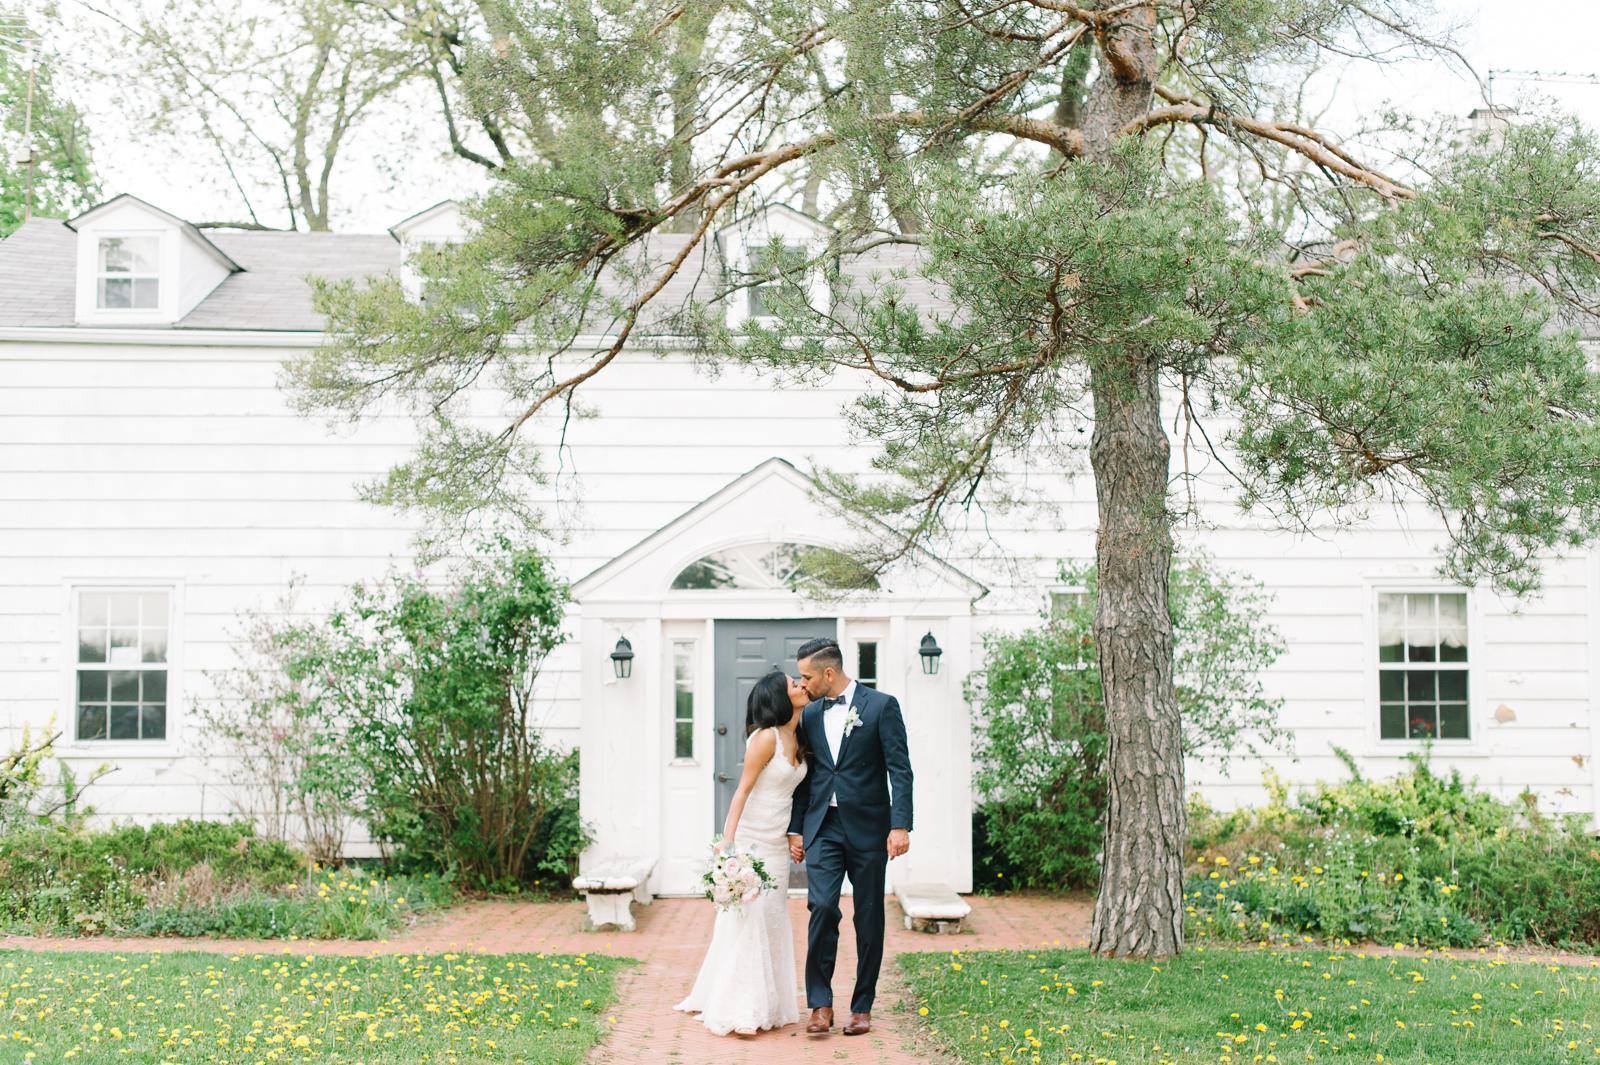 tara-mcmullen-photography-toronto-wedding-photography-alderlea-mansion-wedding-alderlea-wedding-brampton-scotsdale-farm-wedding-reem-acra-wedding-010